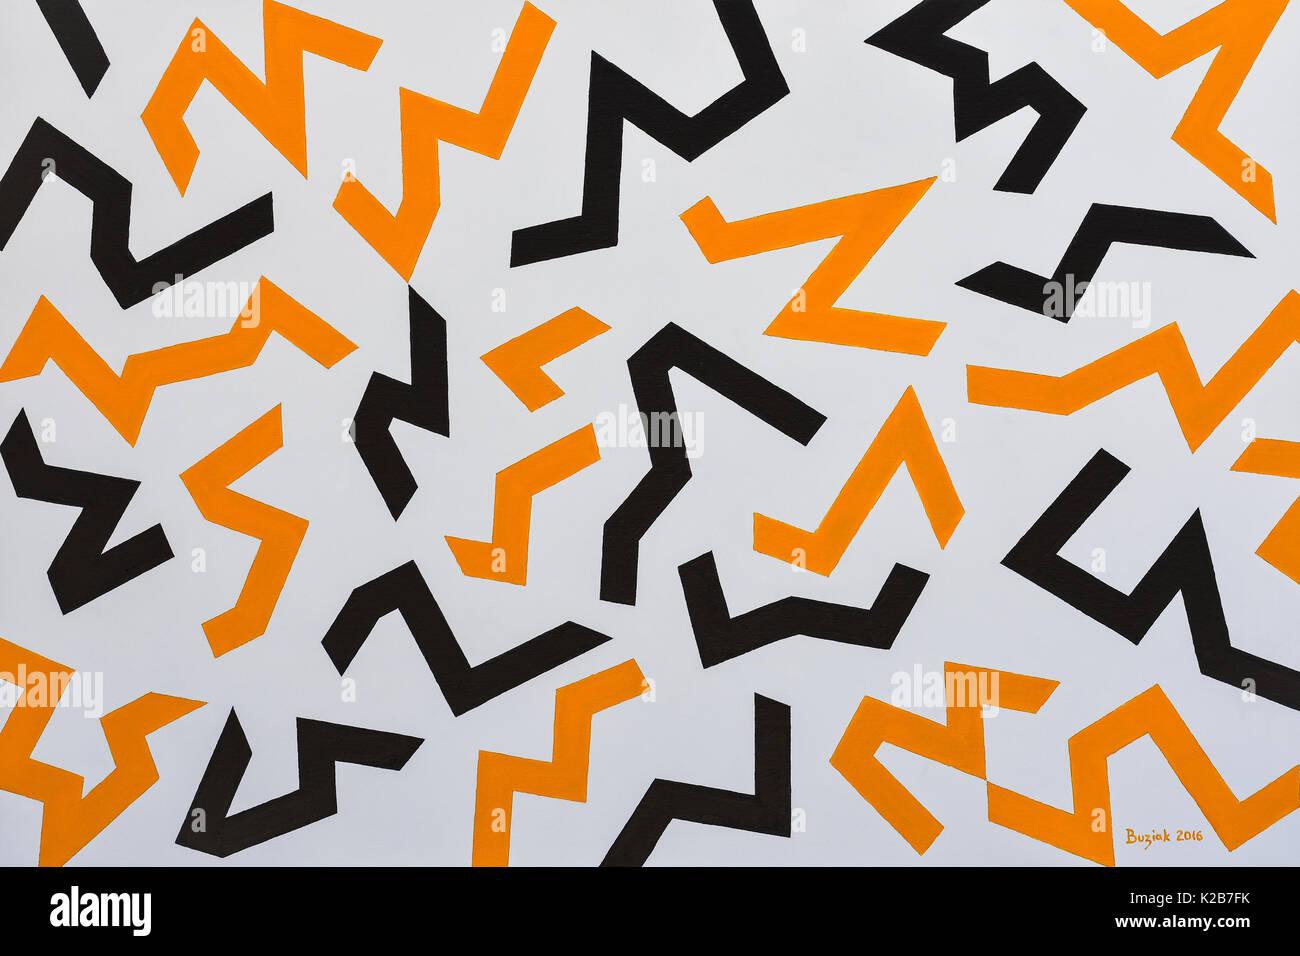 'Vauban's Hazard Stripes' - abstract artwork by Ed Buziak. - Stock Image